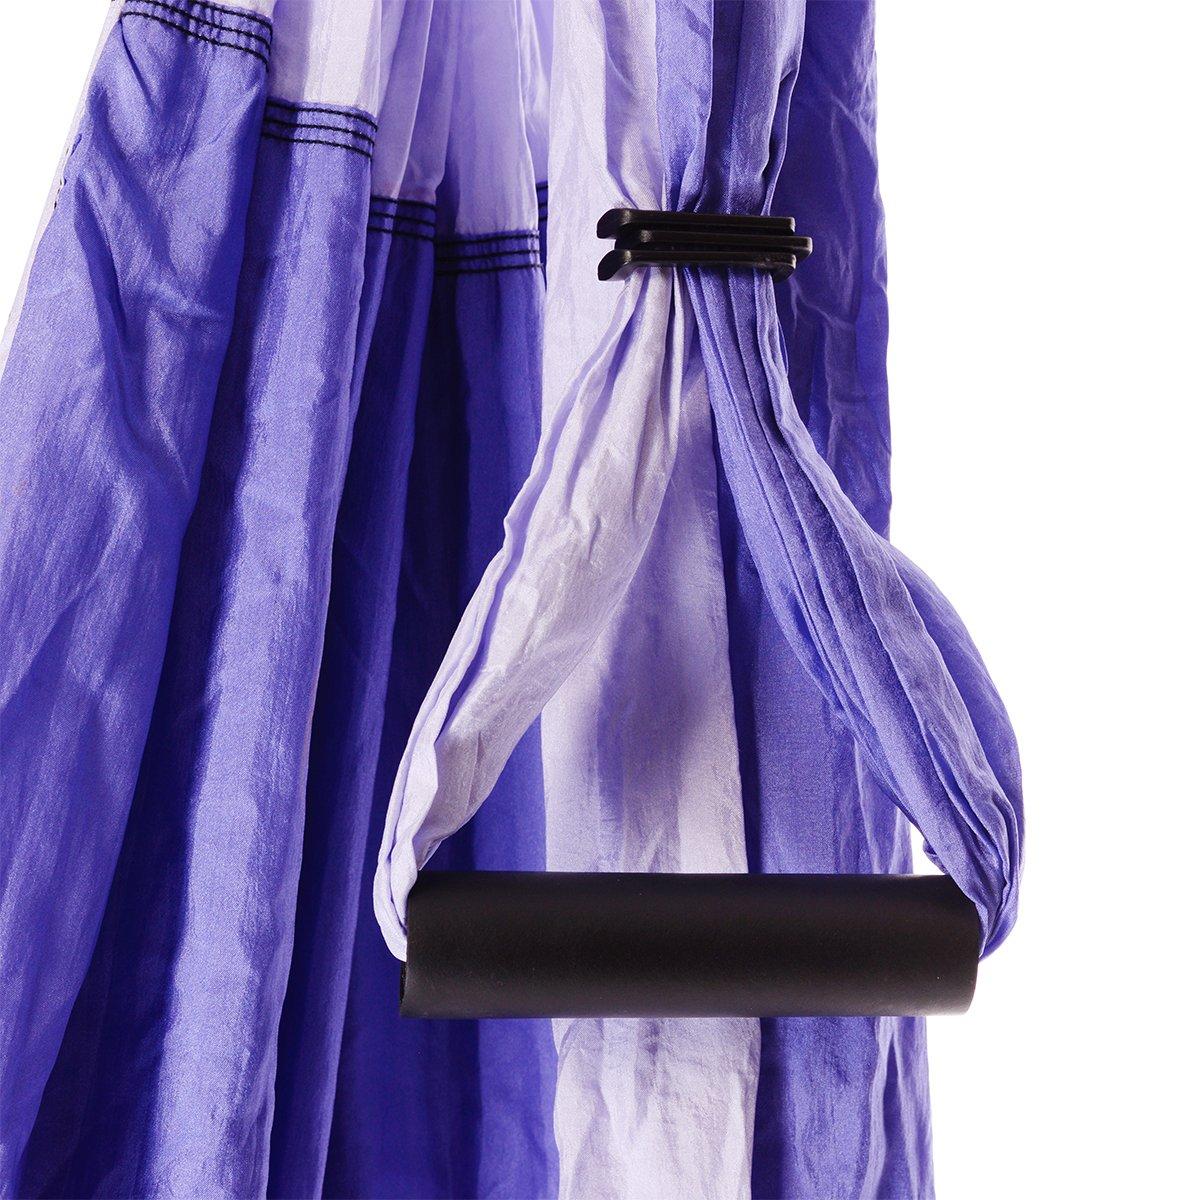 Bundle - 2 Items: Yoga Trapeze Purple & Yoga Wonder Wheel Blue [Bundle] - By YOGABODY - with 2 Free DVD by YOGABODY (Image #6)